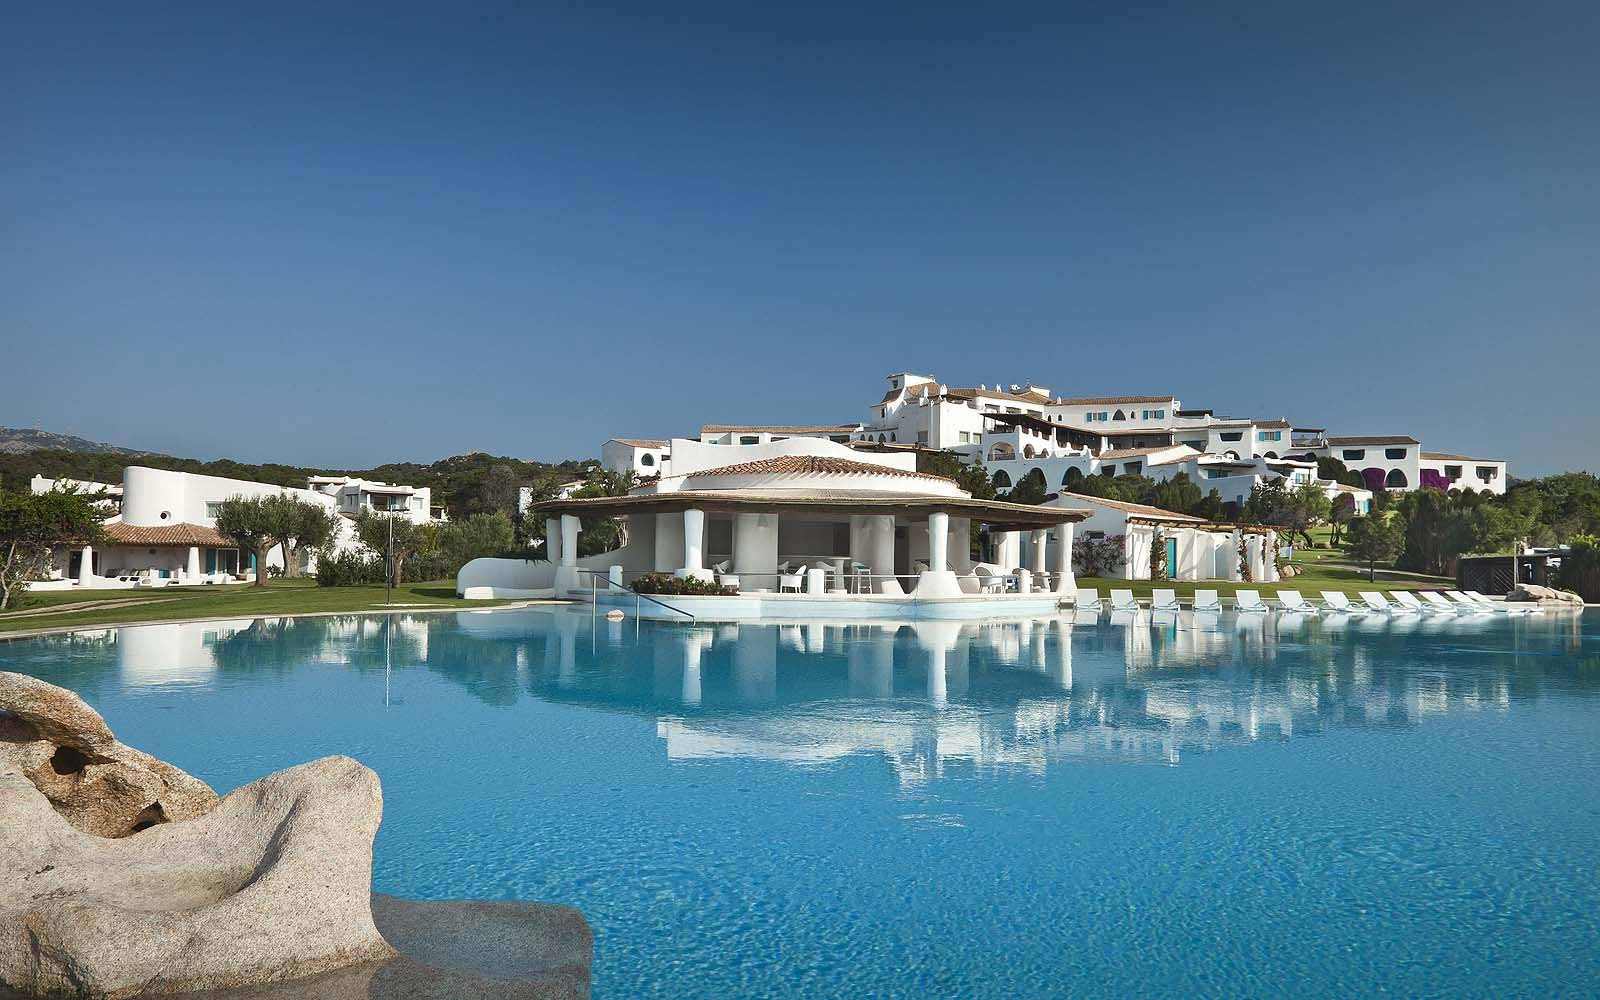 Swimming pool at the Hotel Romazzino